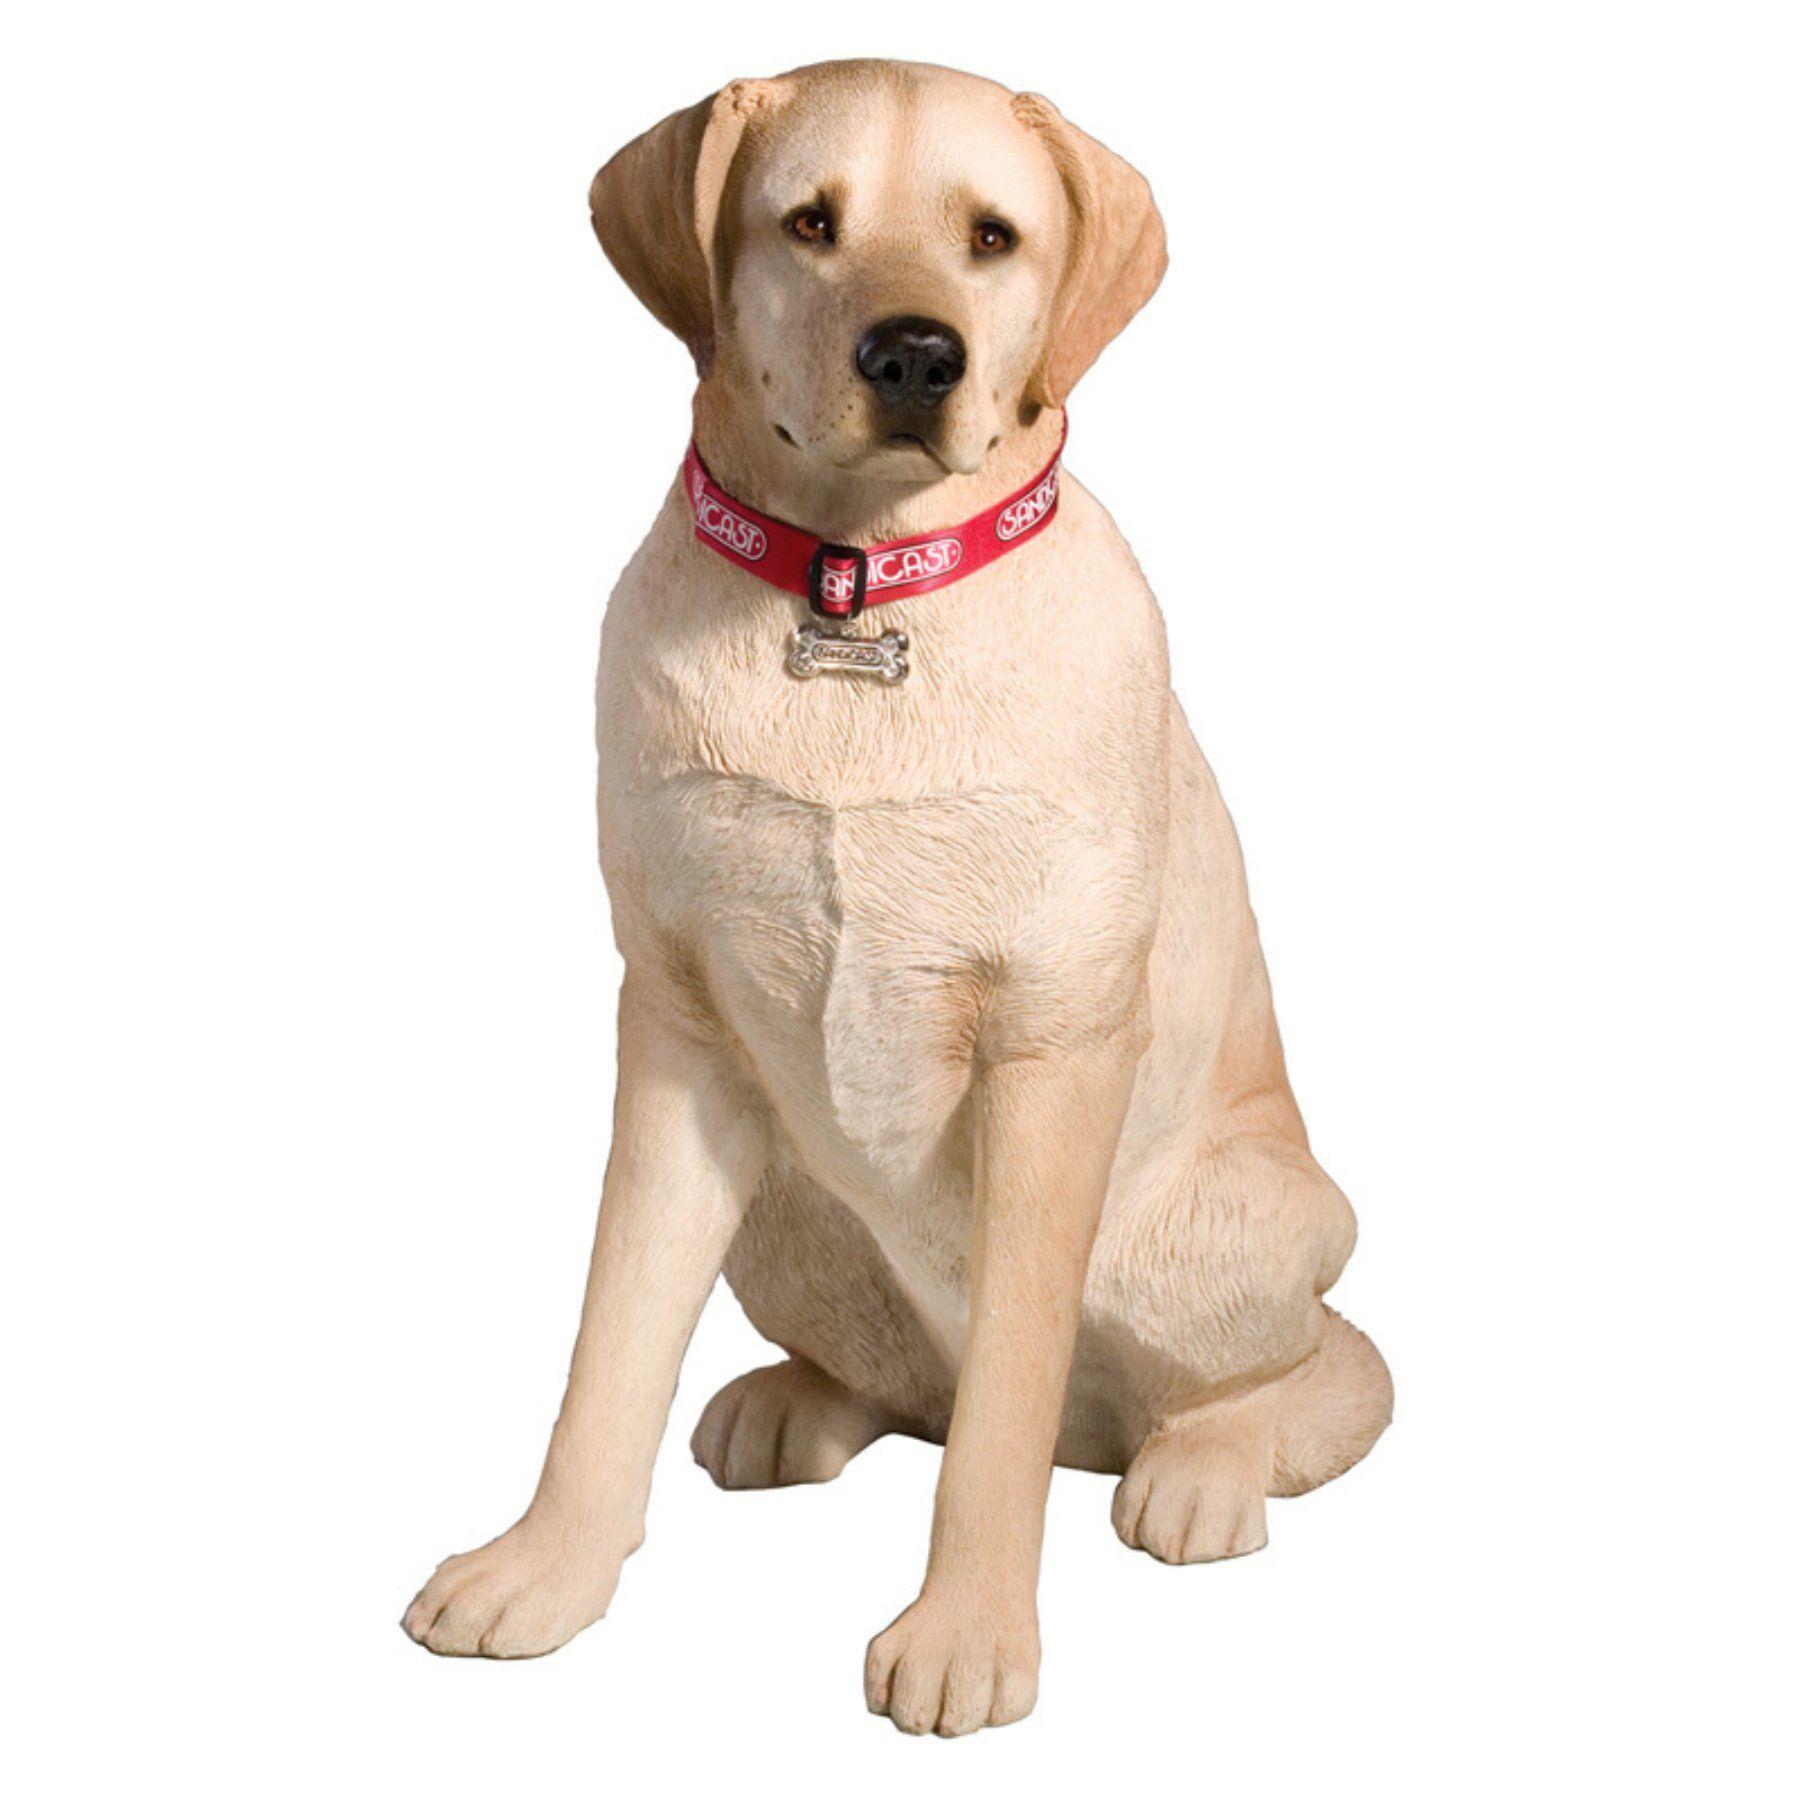 Sandicast Life Size Large Yellow Labrador Retriever Sculpture